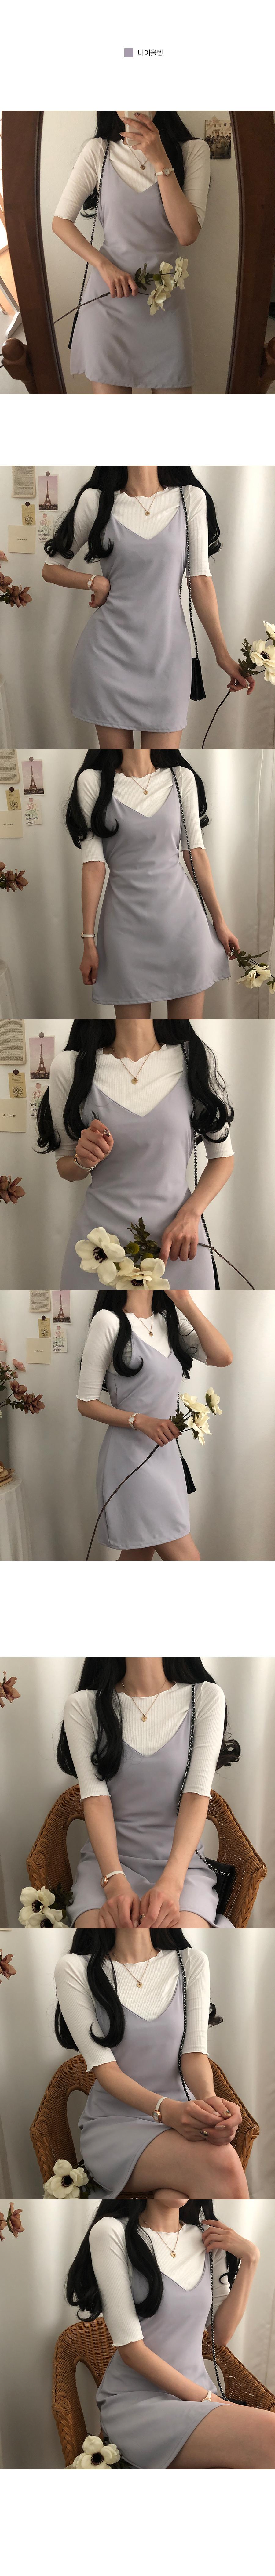 Juice cooling texture bustier mini Dress